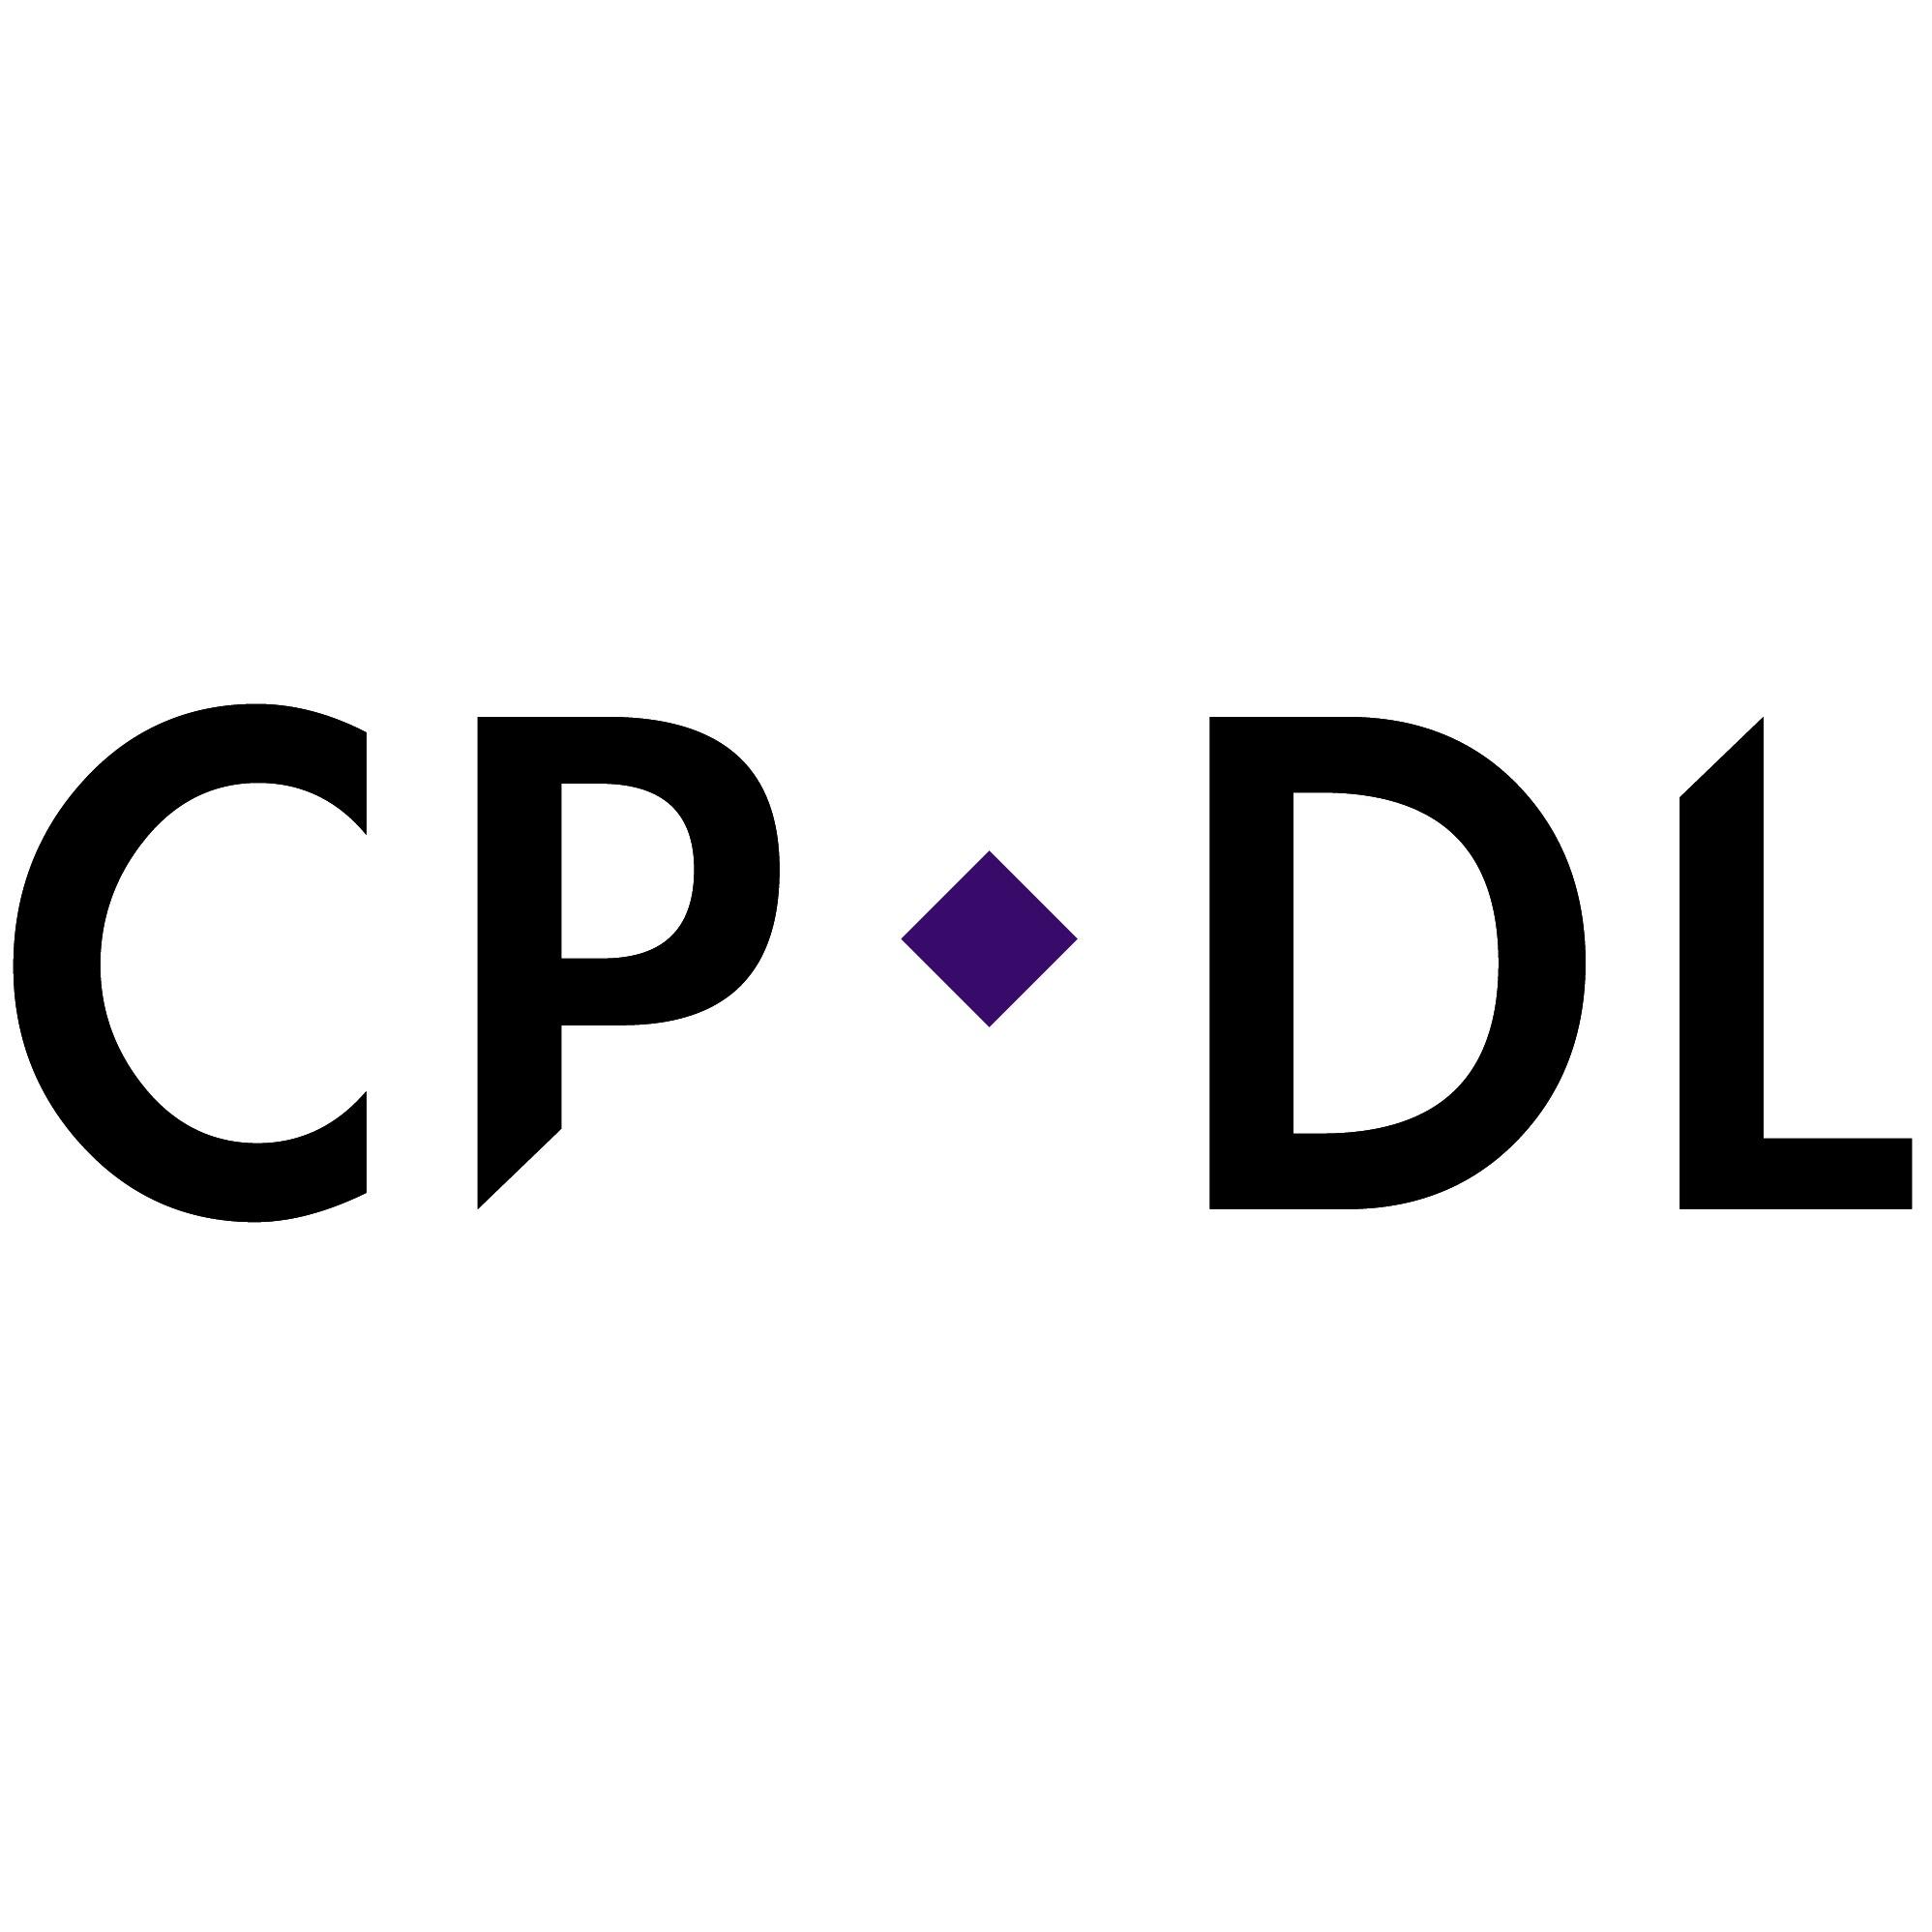 the CP-DL logo.